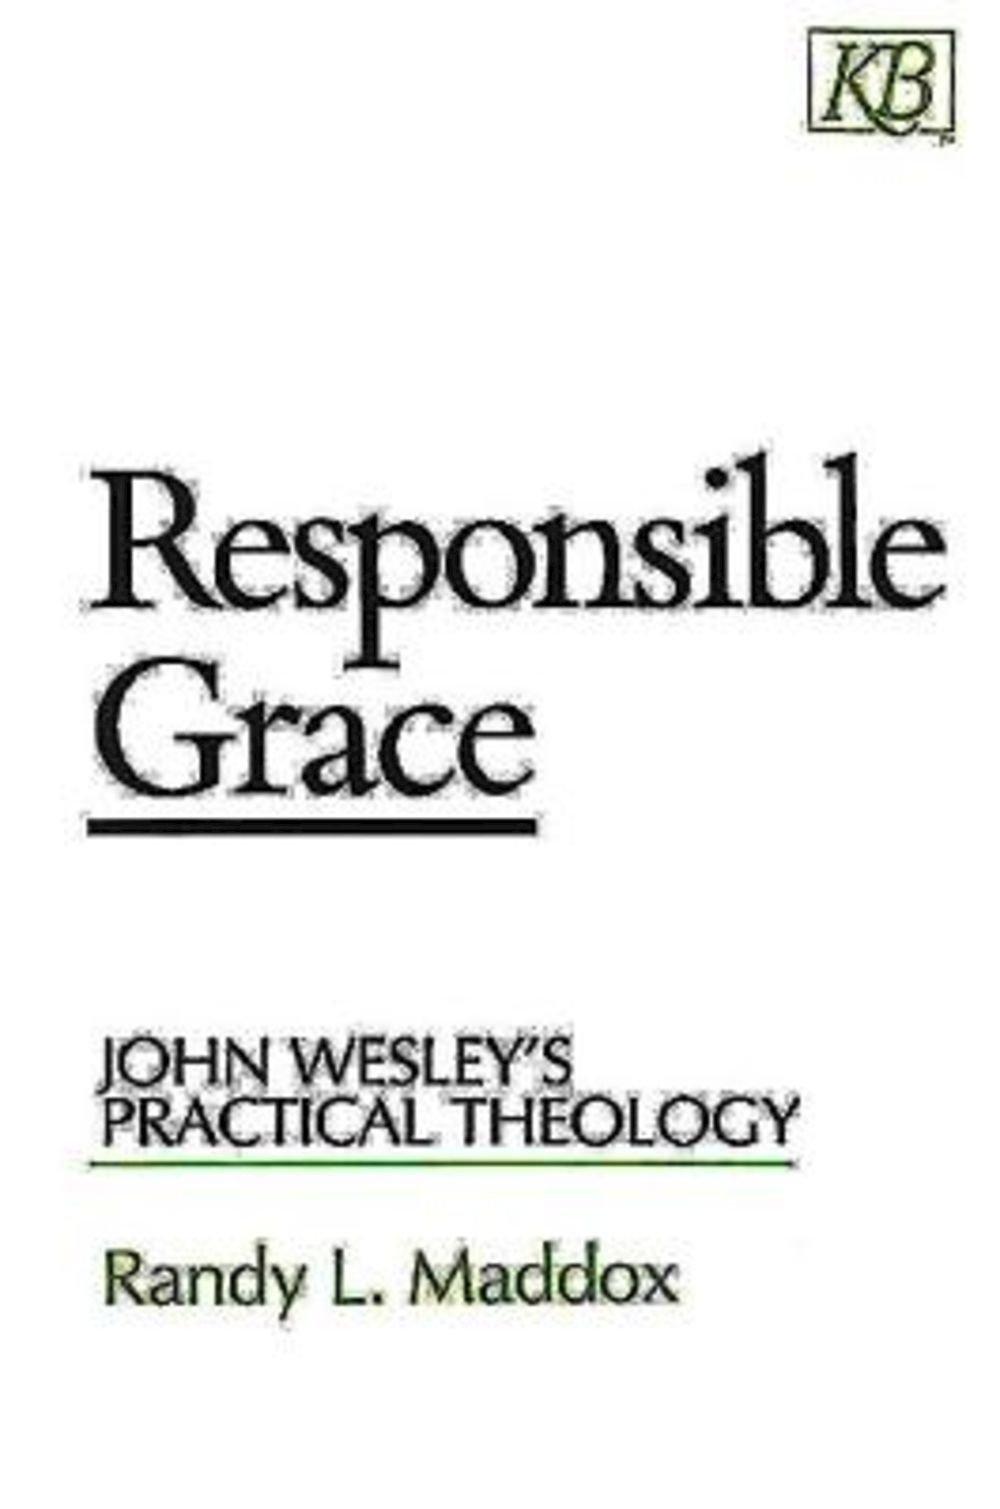 Responsible Grace: John Wesley's Practical Theology (kingswood Series):  Randy L Maddox: 9780687003341: Amazon: Books